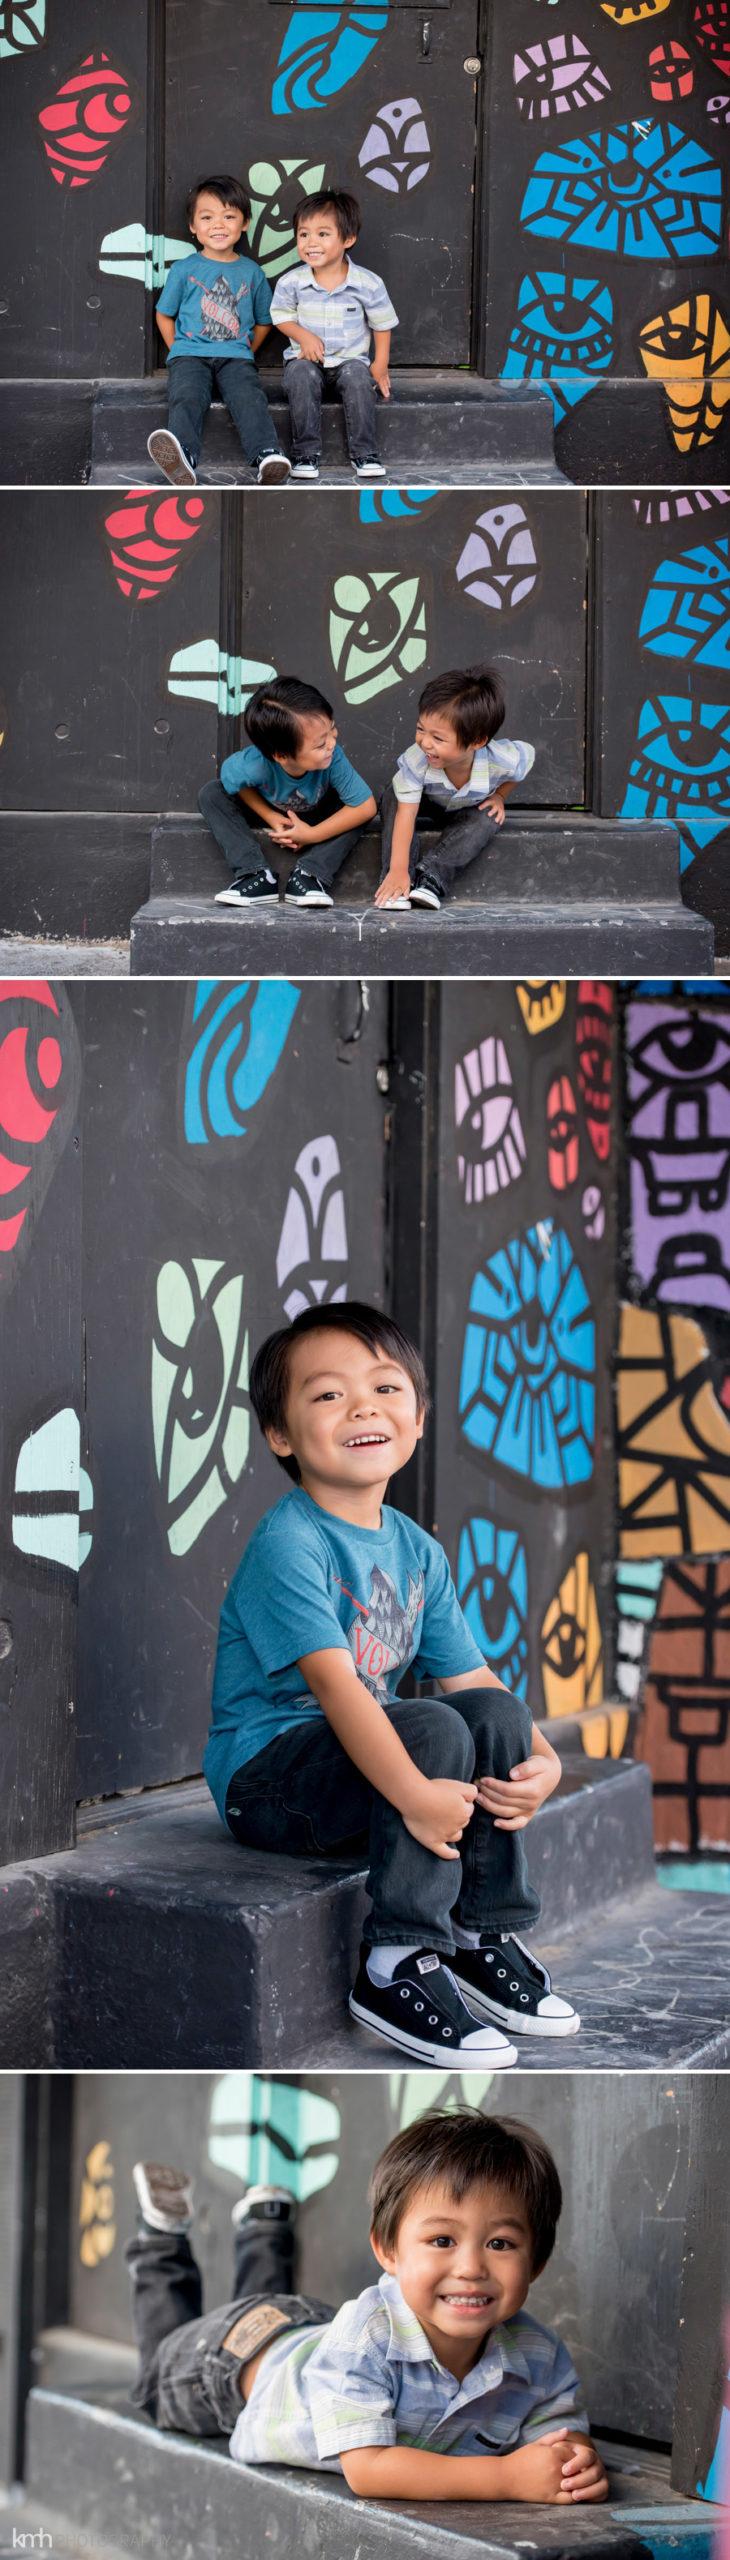 kmh-downtown-las-vegas-family-photography-1115-2